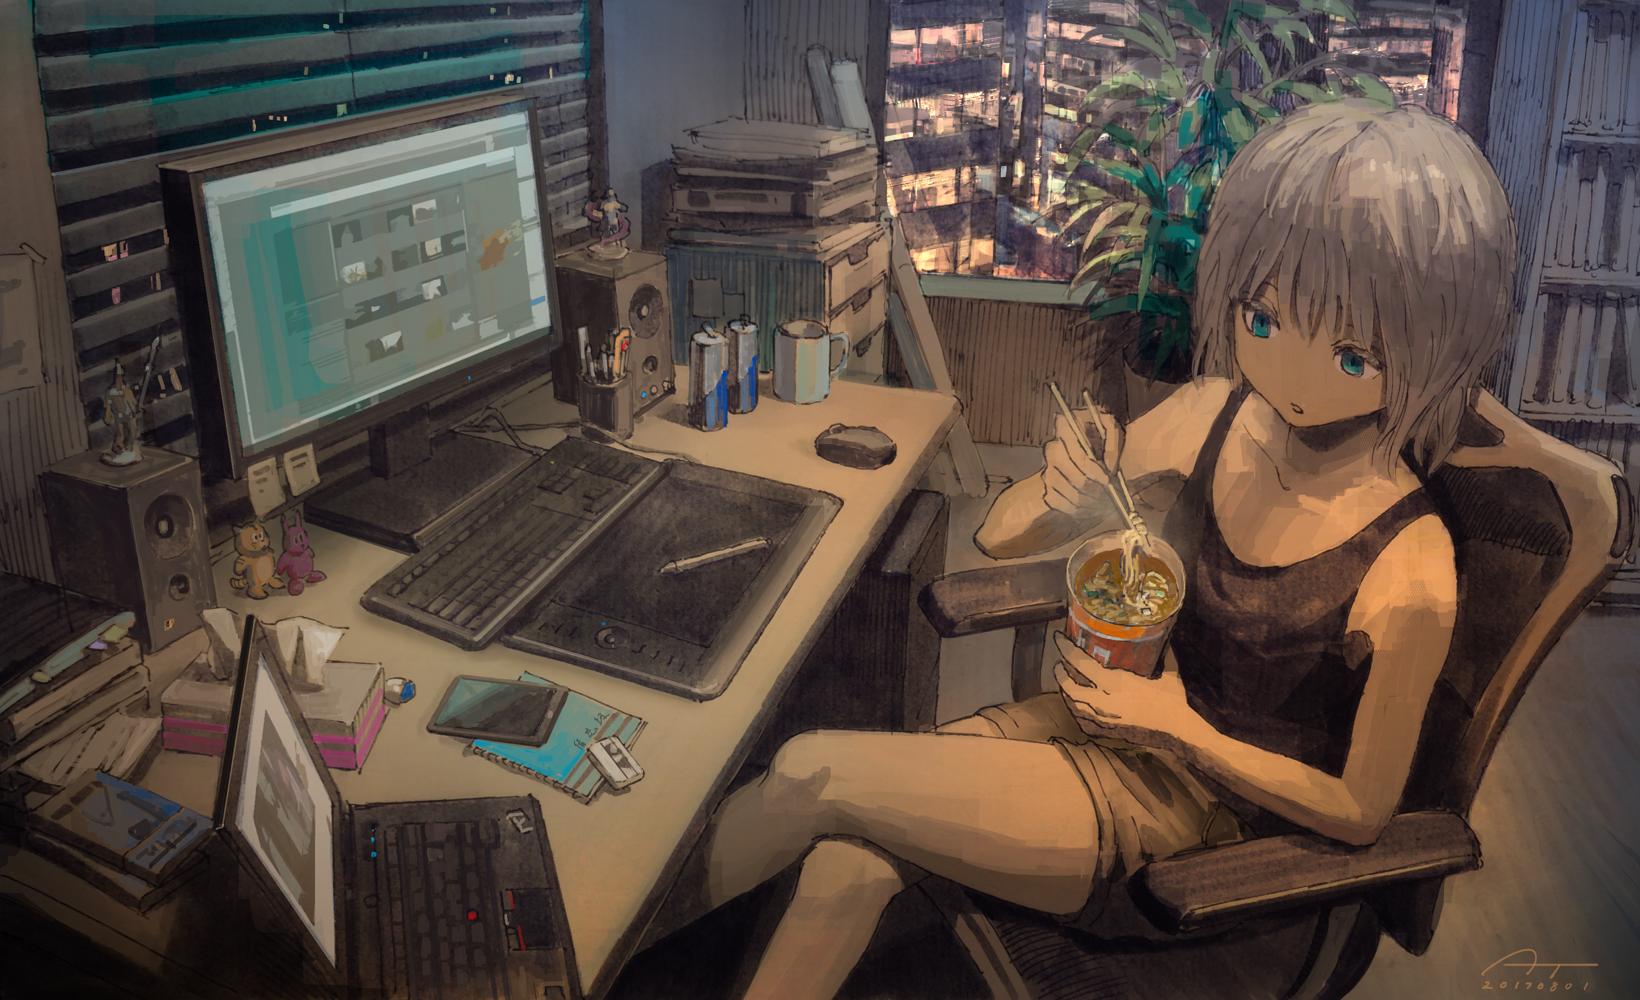 Anime 1640x1000 loneliness alone computer drawer grey hair short hair food anime girls Tokunaga Akimasa